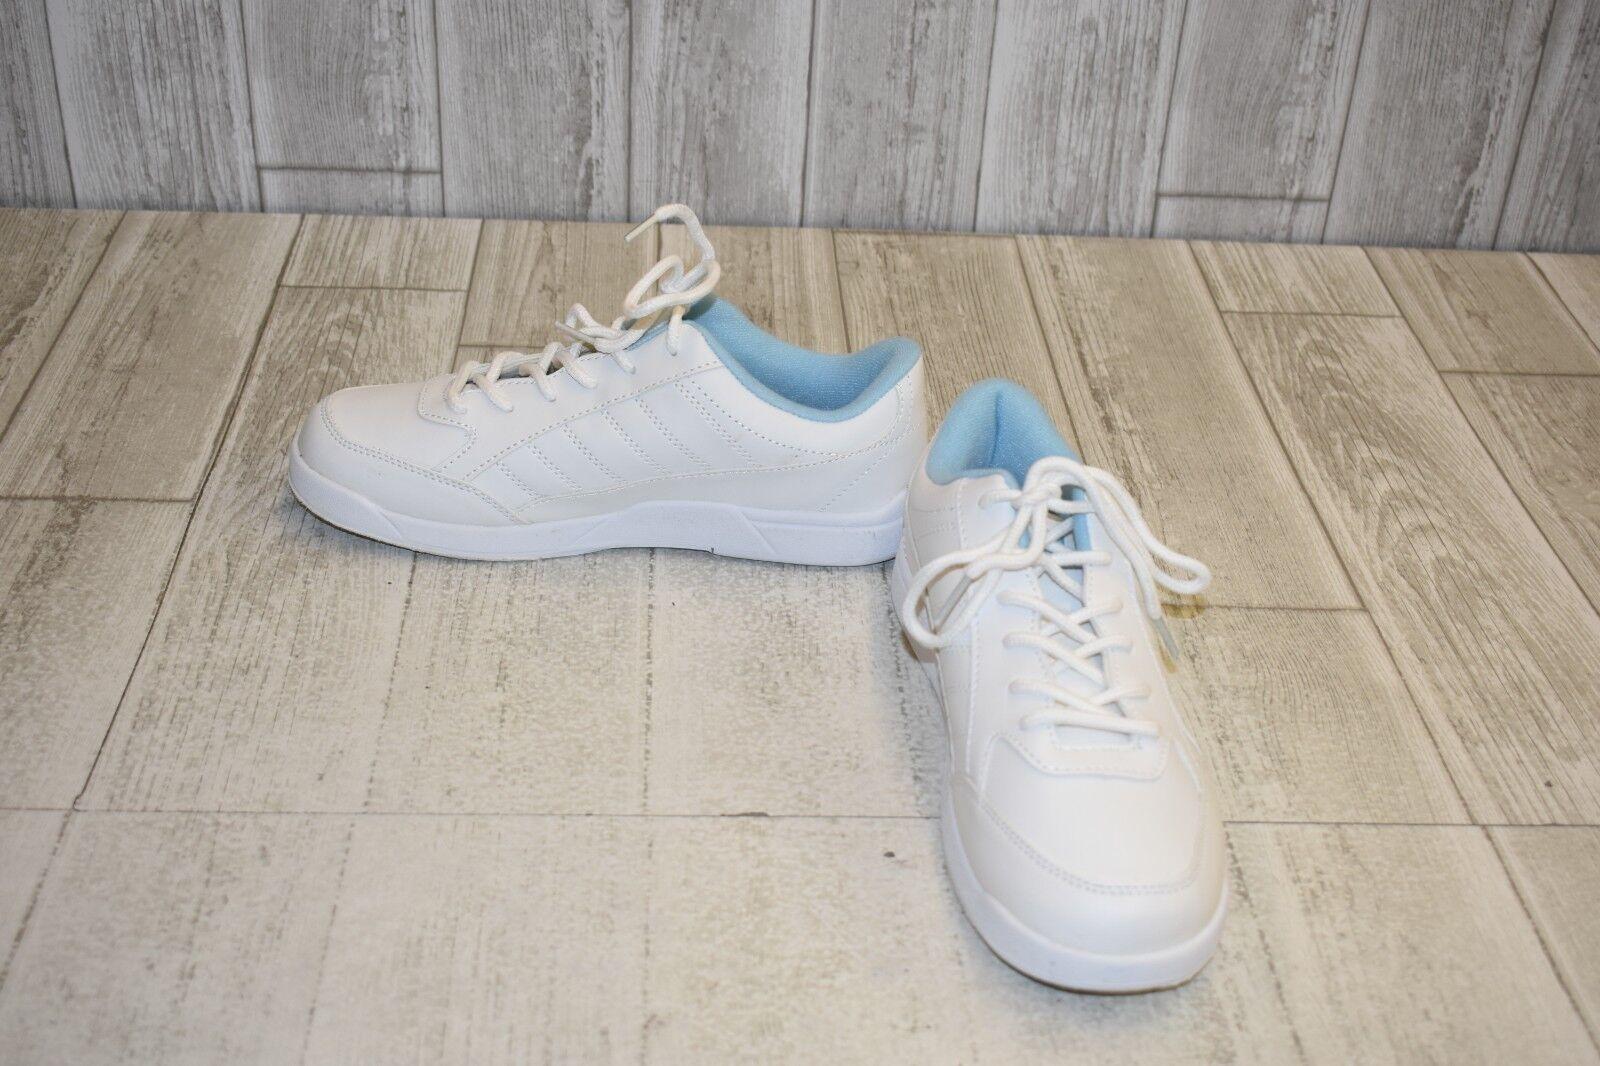 BSI 422 Bowling shoes - Women's Size 8.5, White bluee